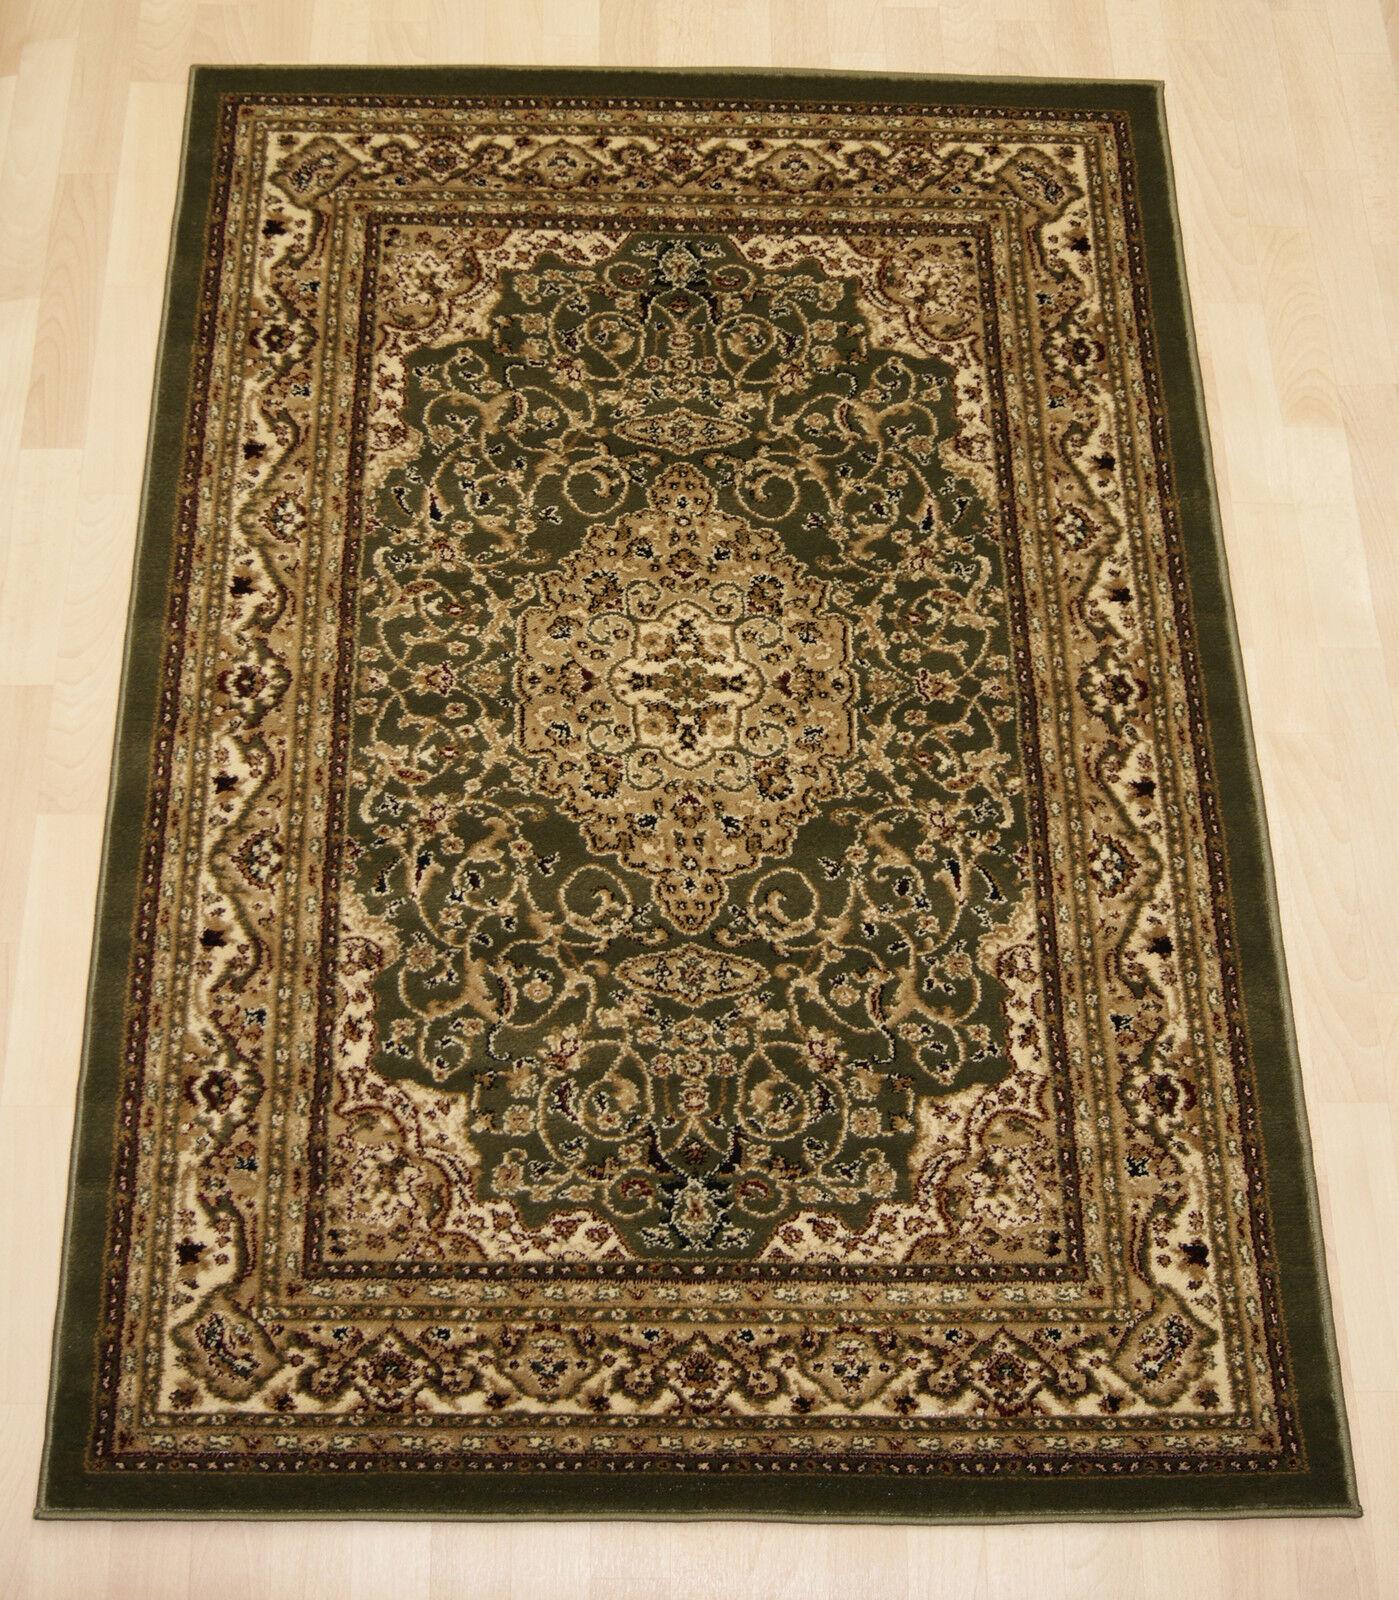 Persian Oriental Vert Crème Floral Silk Small Small Small Medium Extra Large Tapis 240x330cm   Porter-résistance  d9b7d7